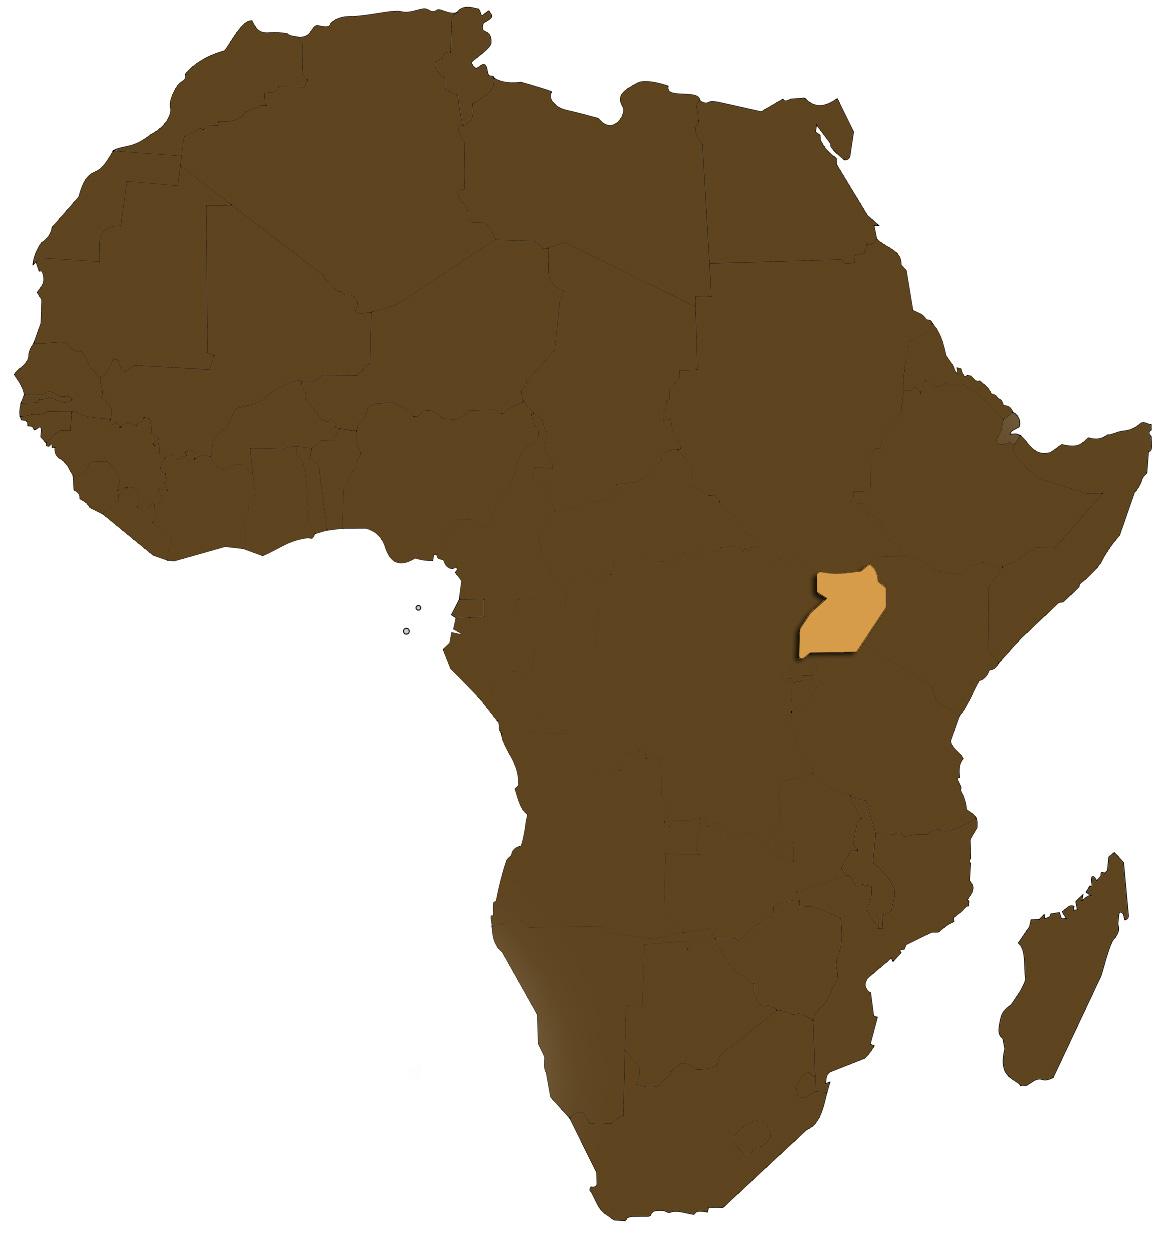 Africaugandamap Dan And Jodes In Gulu Uganda - Where is uganda